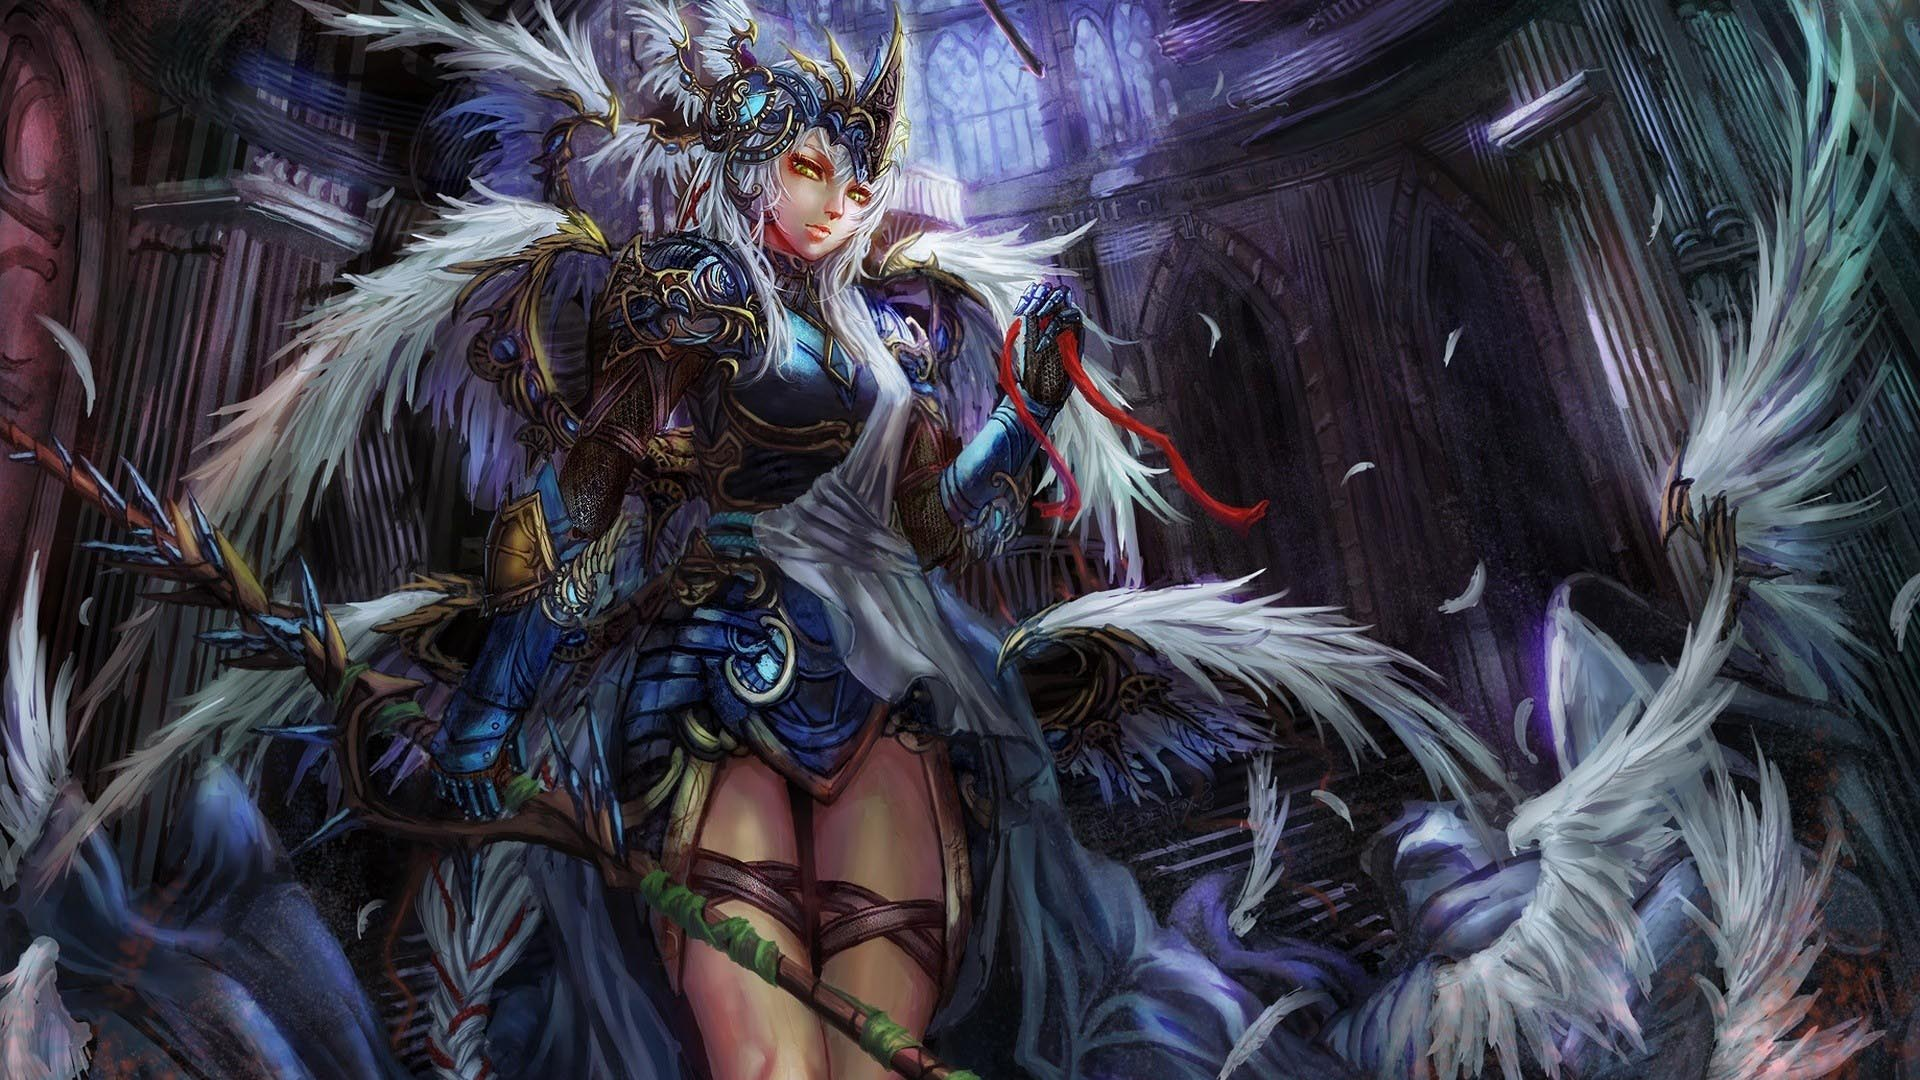 46+ Anime Girl Warrior Wallpaper on WallpaperSafari